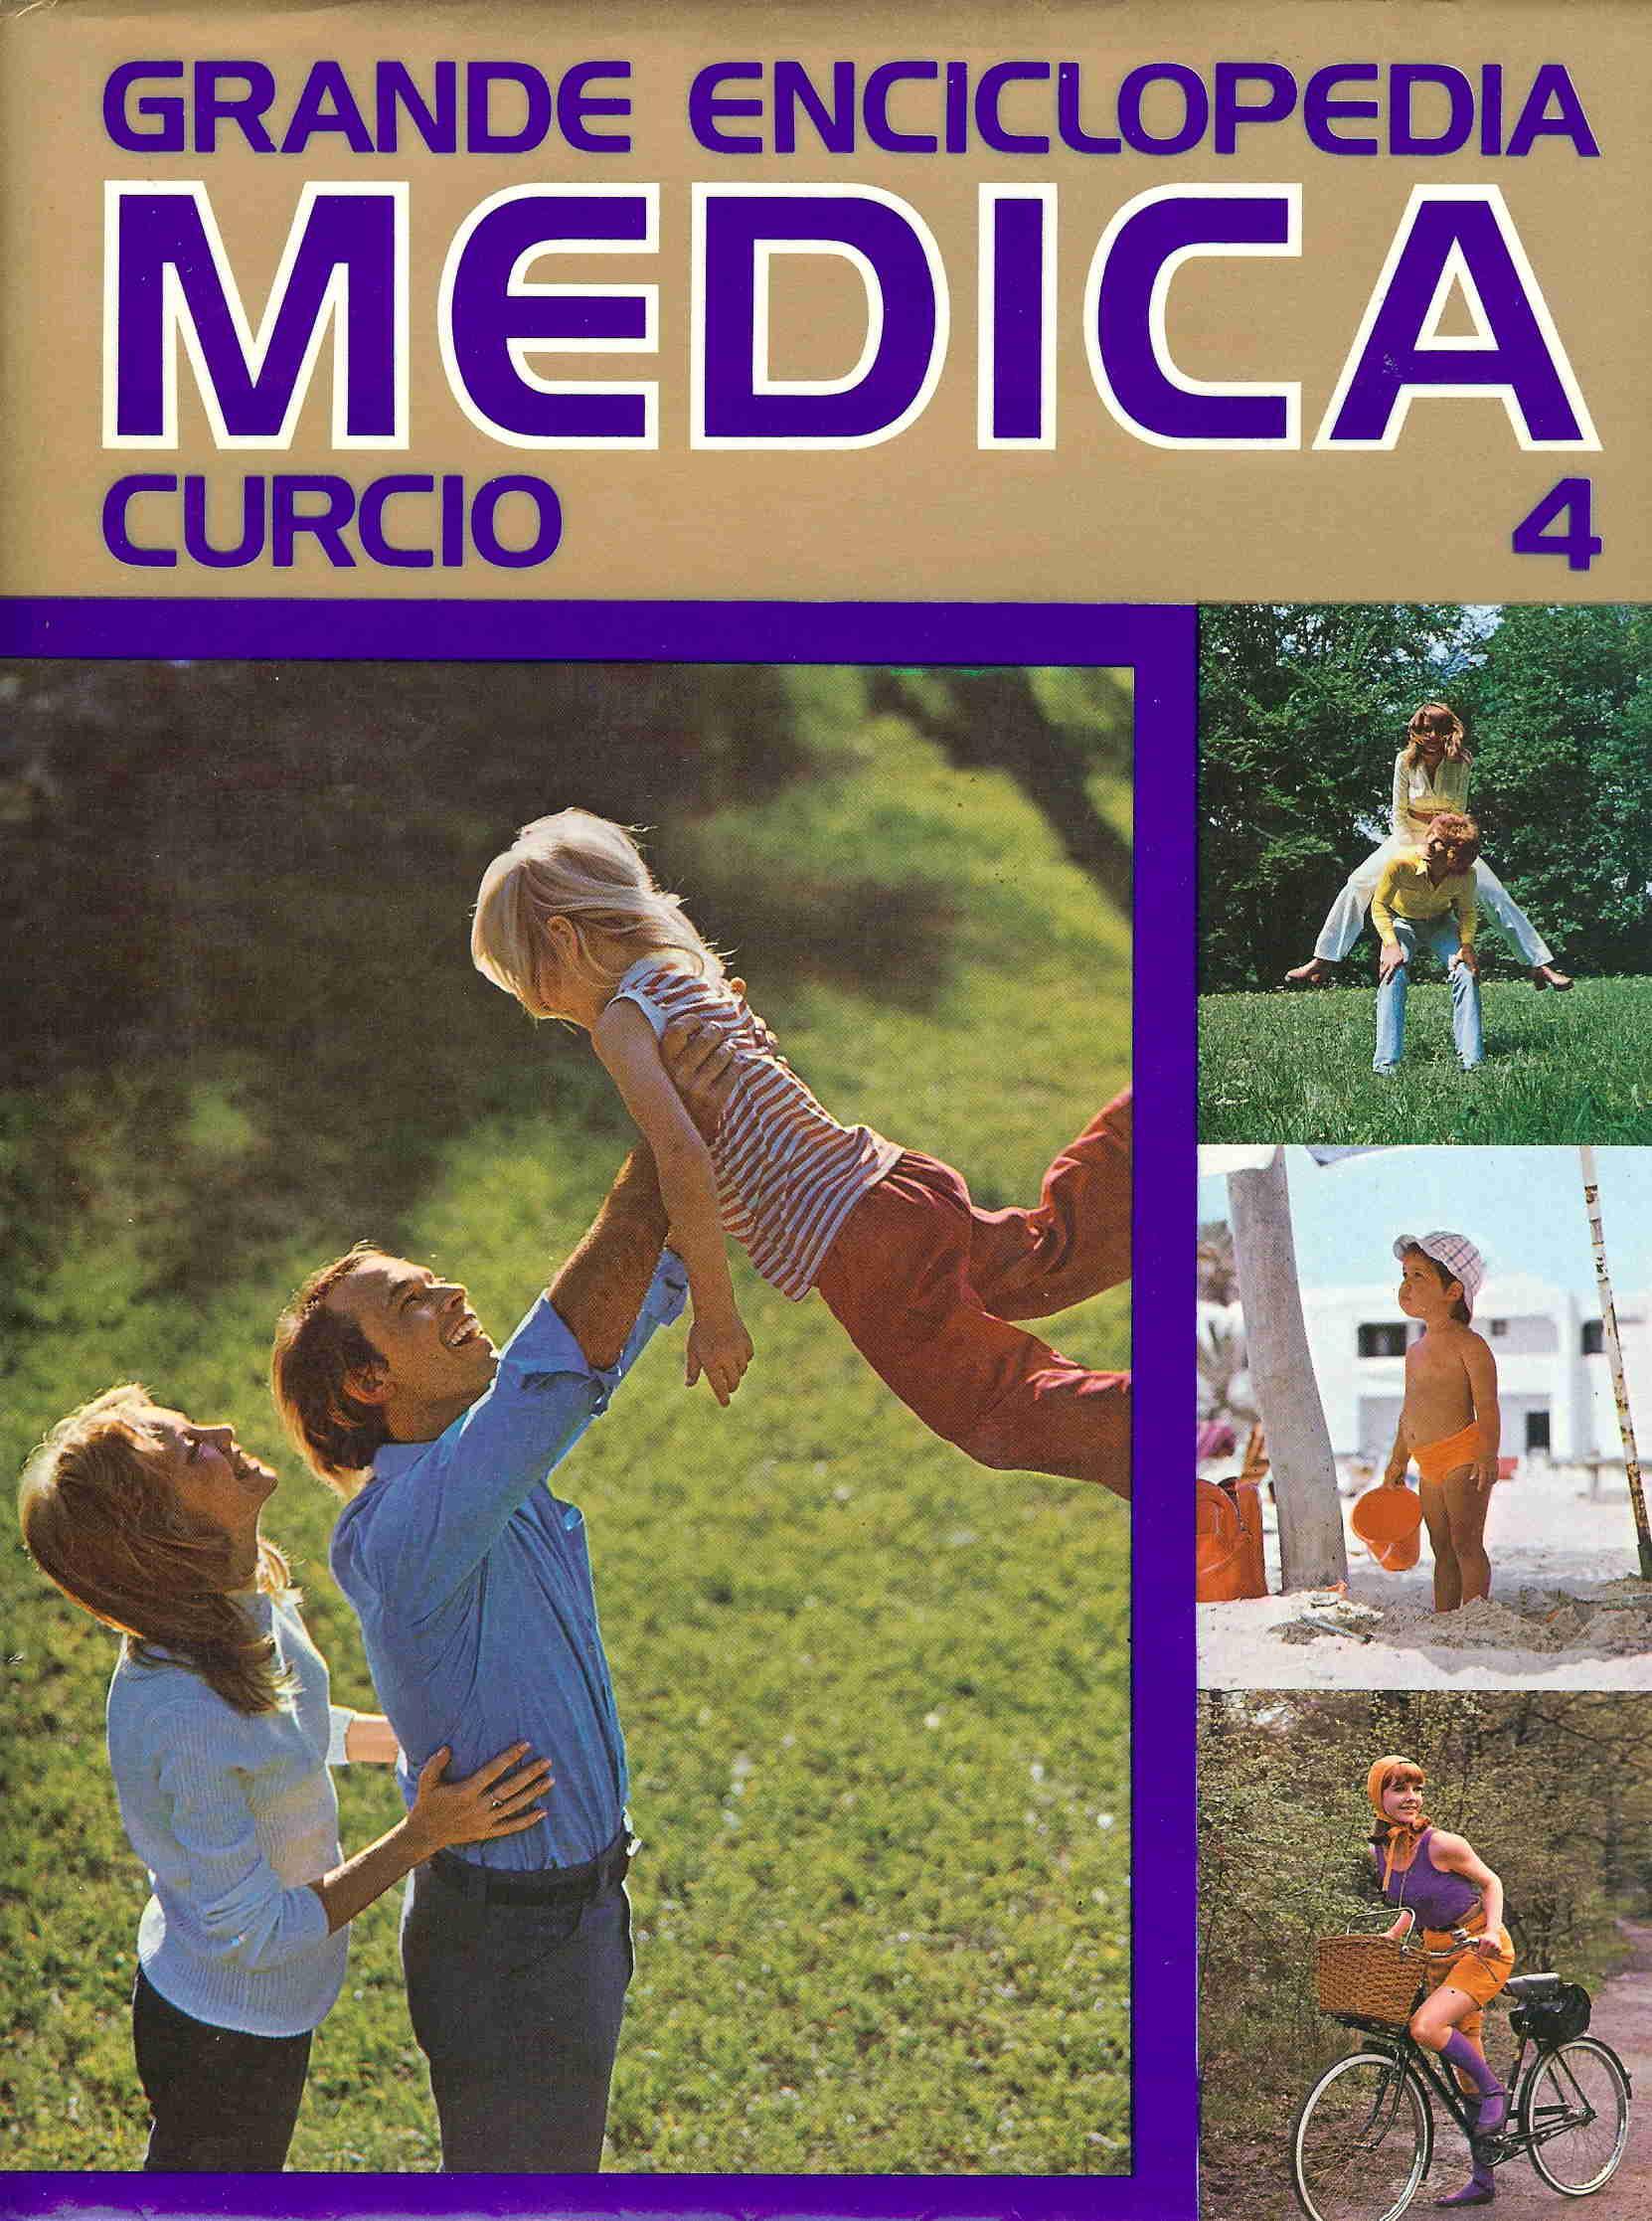 Grande enciclopedia medica - Vol. 4